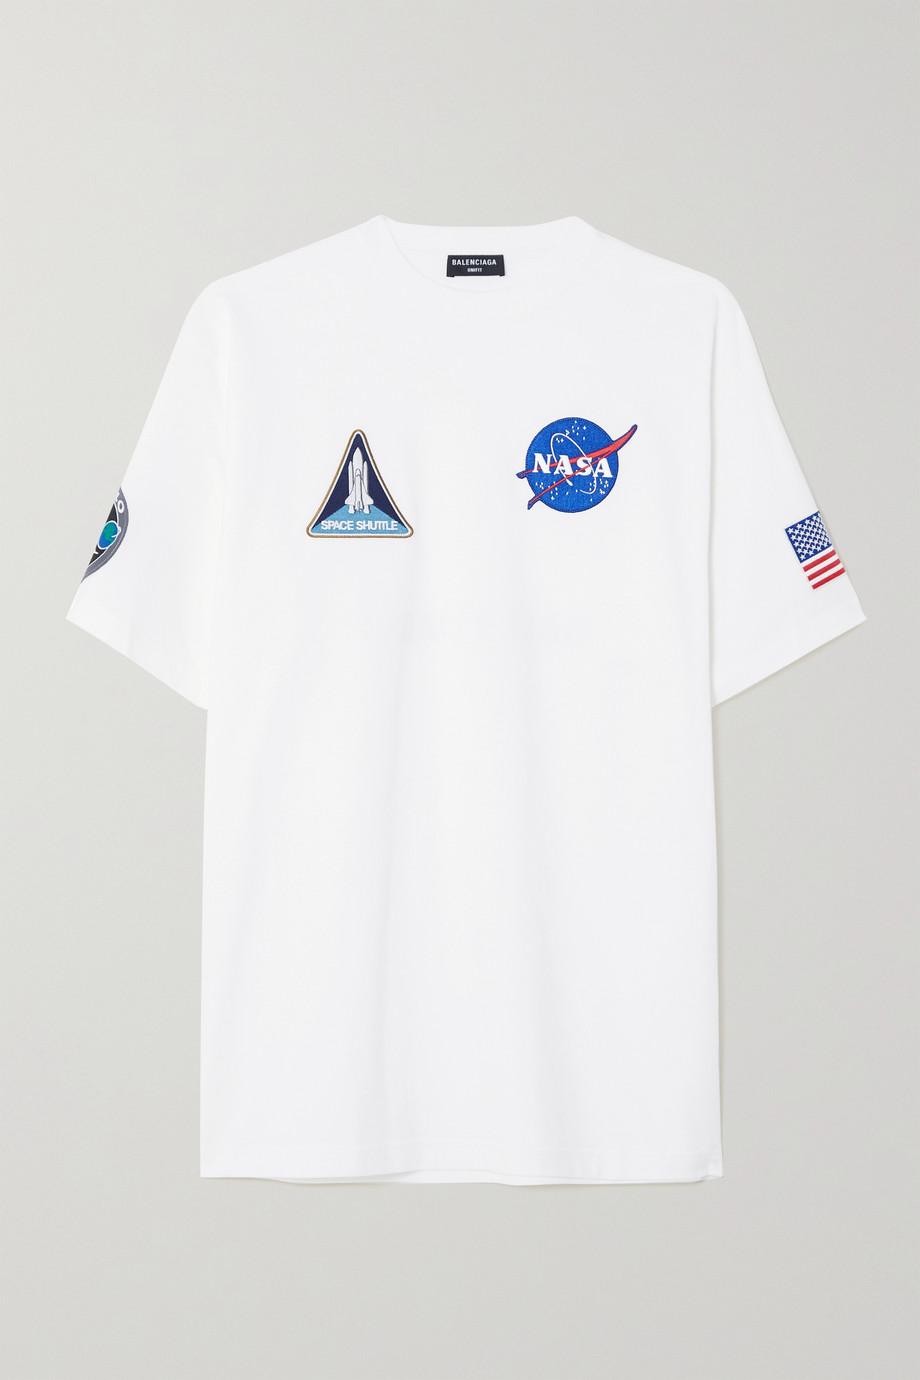 Balenciaga T-shirt oversize en jersey de coton imprimé à appliqués NASA Space